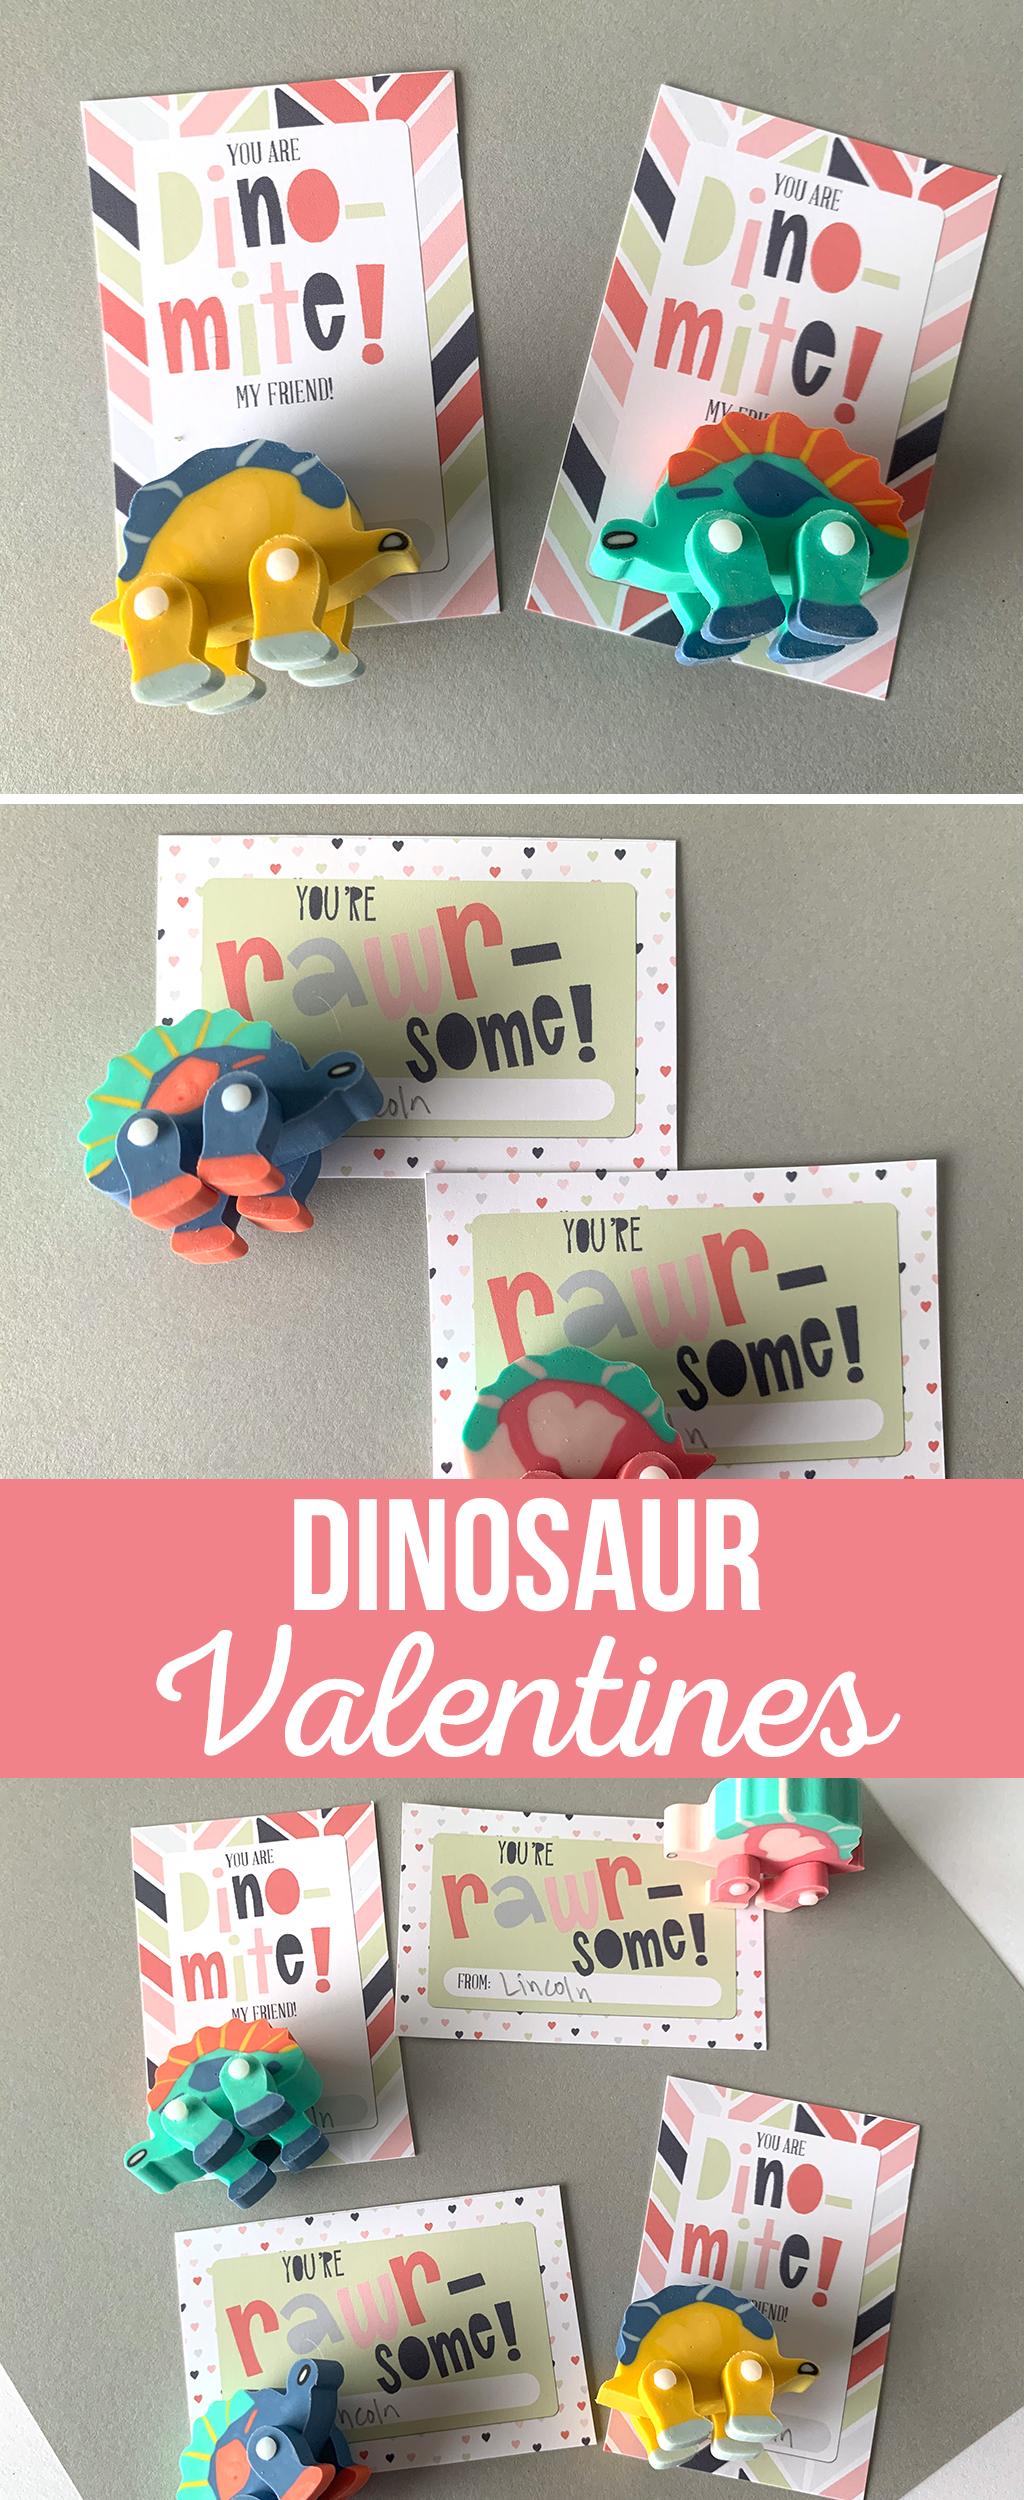 Dinosaur Valentines on a gray background with Dinosaur erasers.